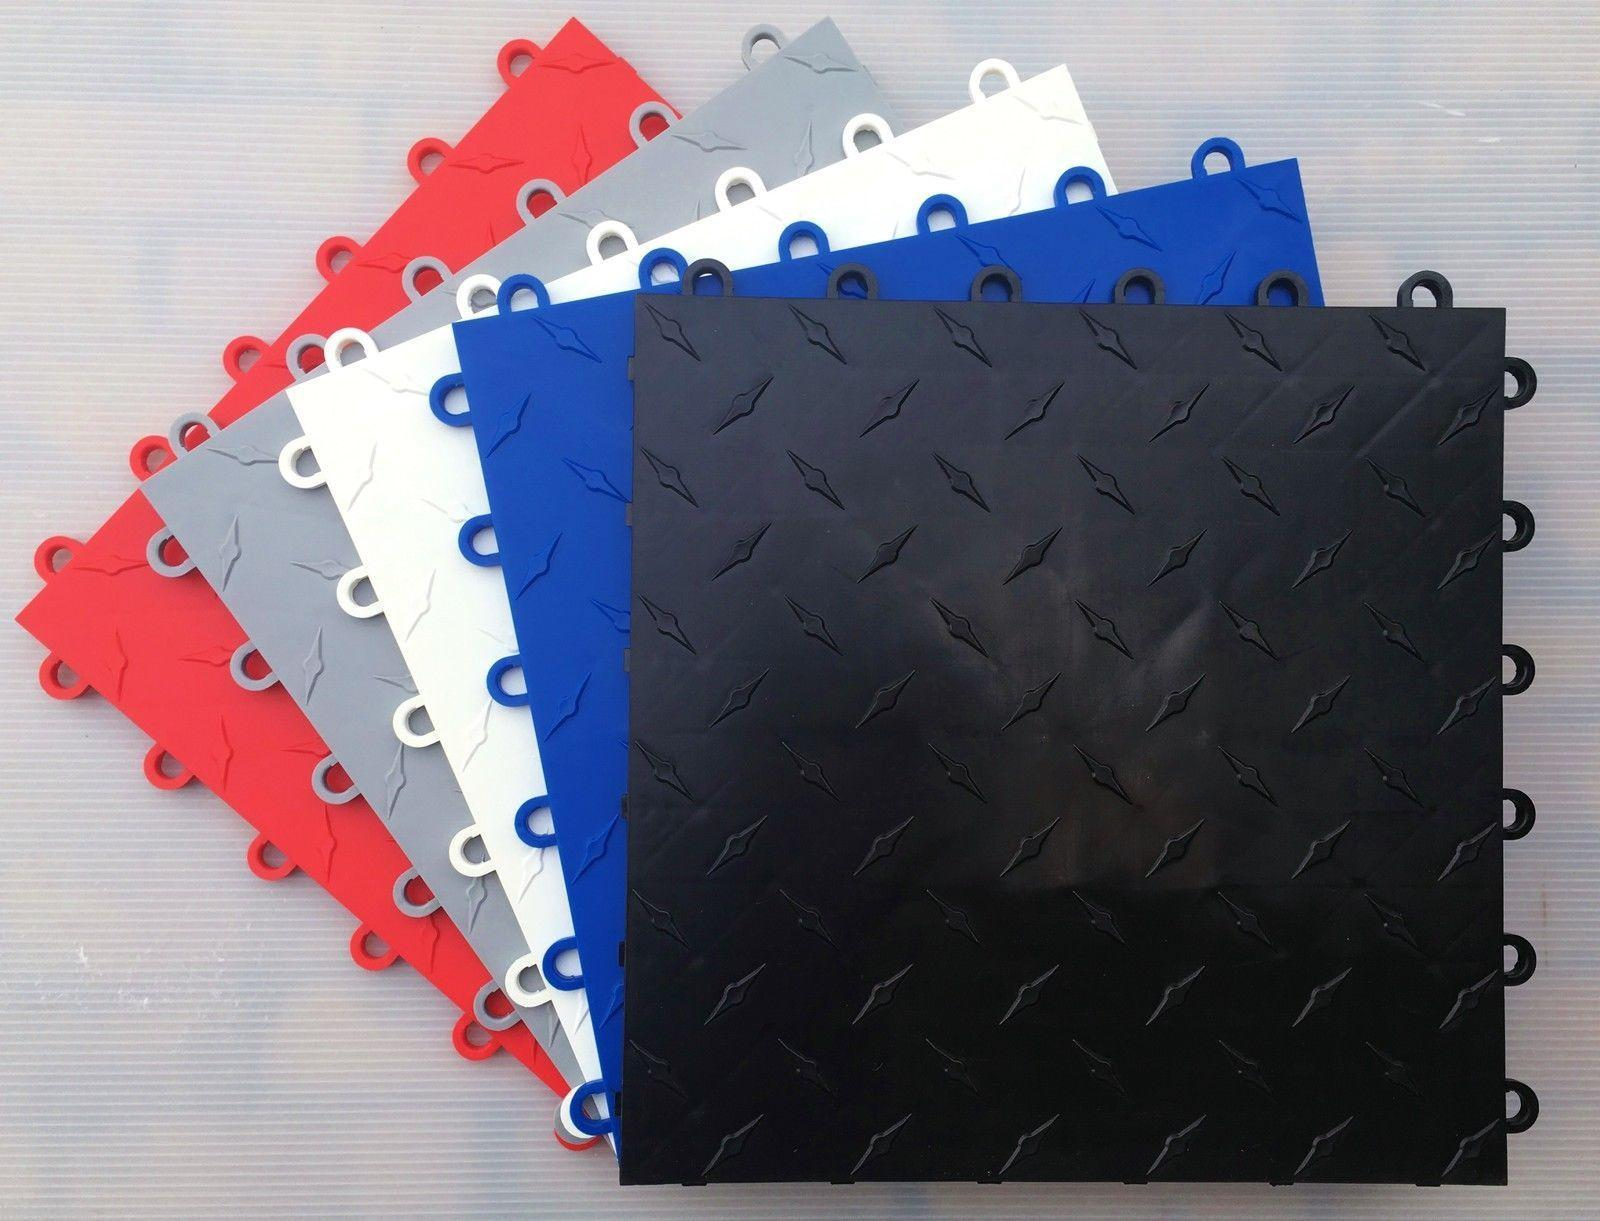 NEW Highest Quanlity Polypropylene Top Basement Floating Floor Tiles Interlocking Mat Coin - Modular Garage Flooring System